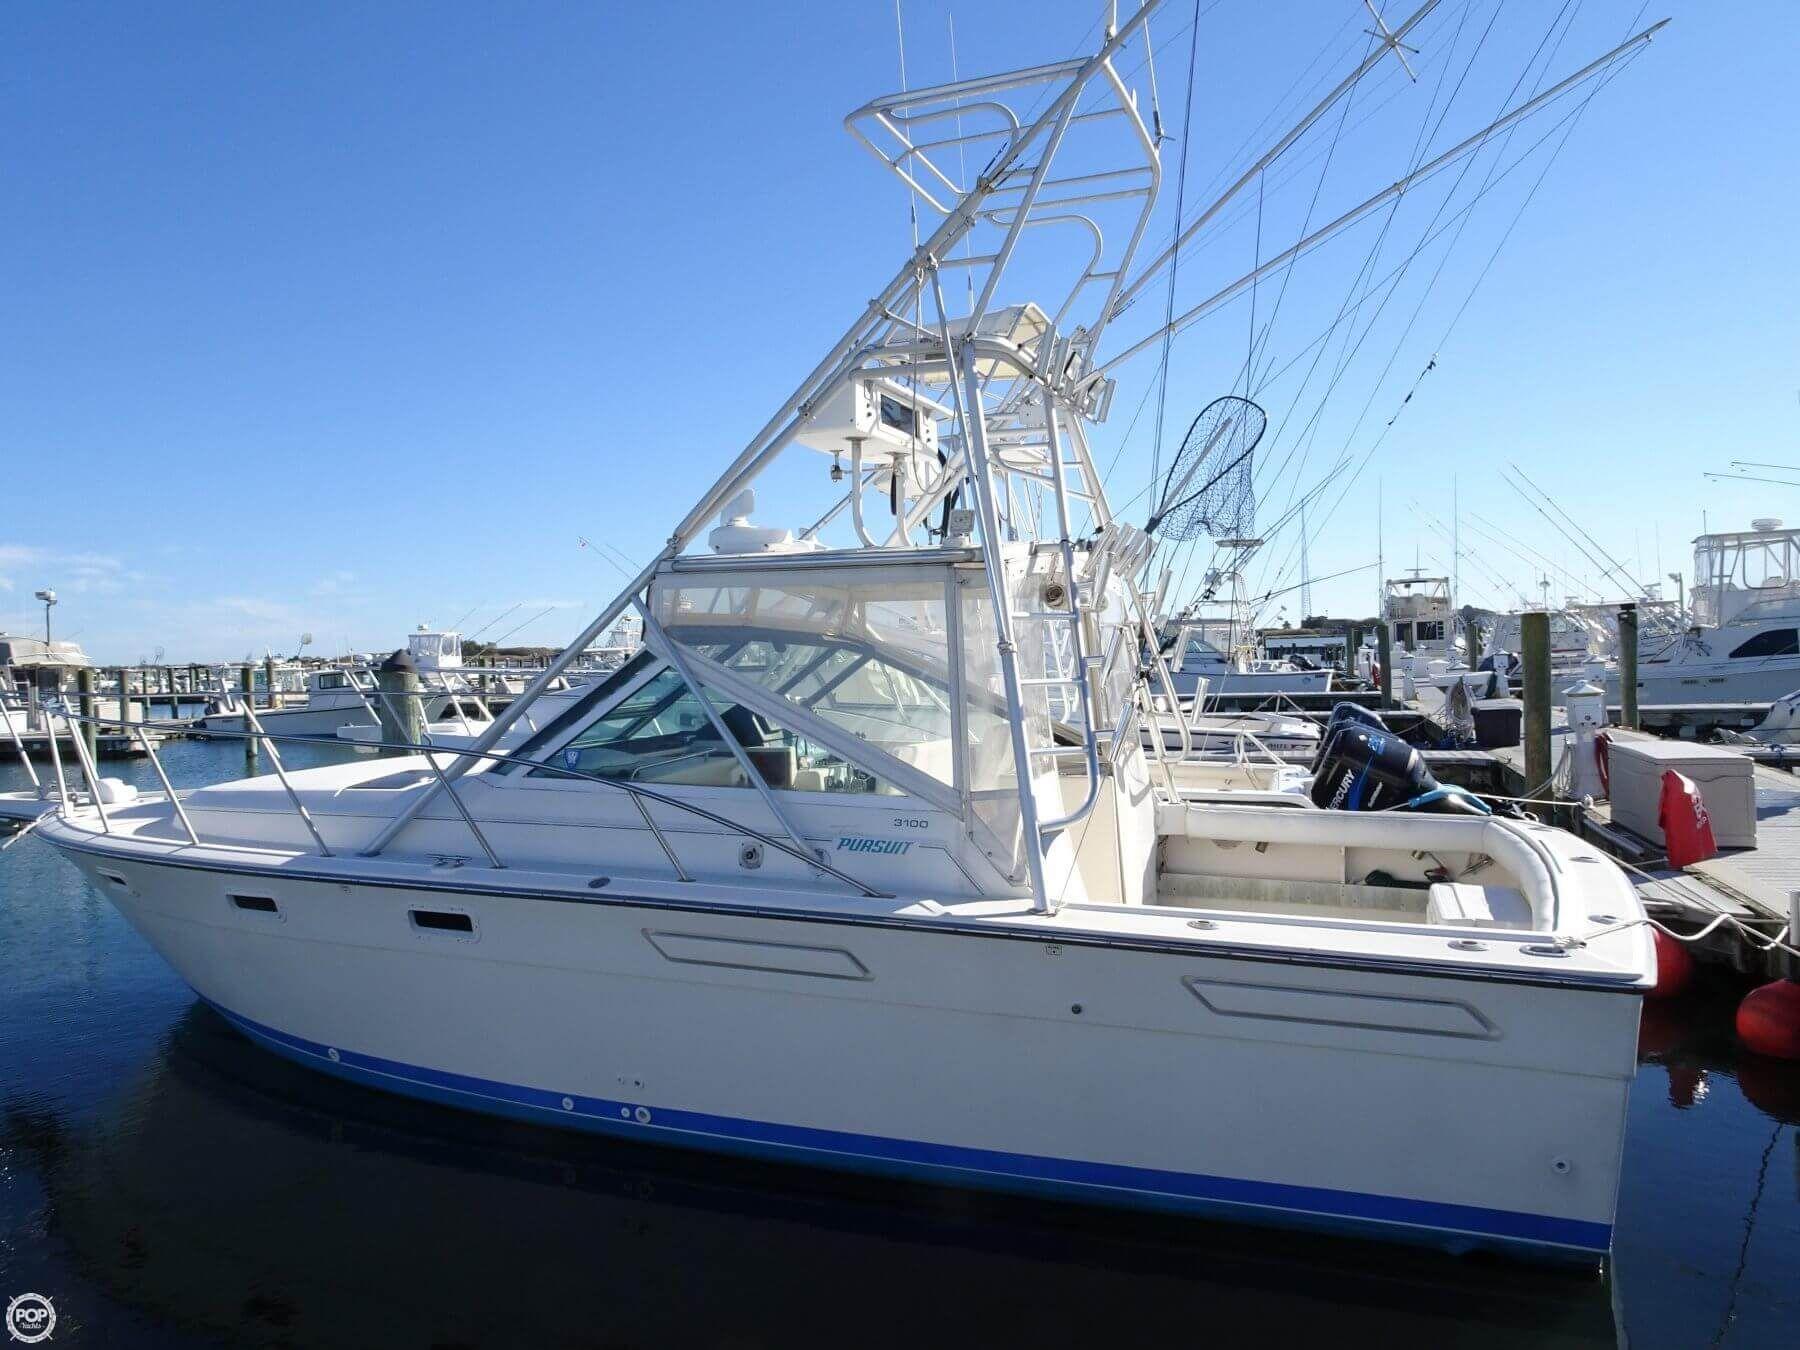 3100 Fishing yachts, Fishing boats, Boat